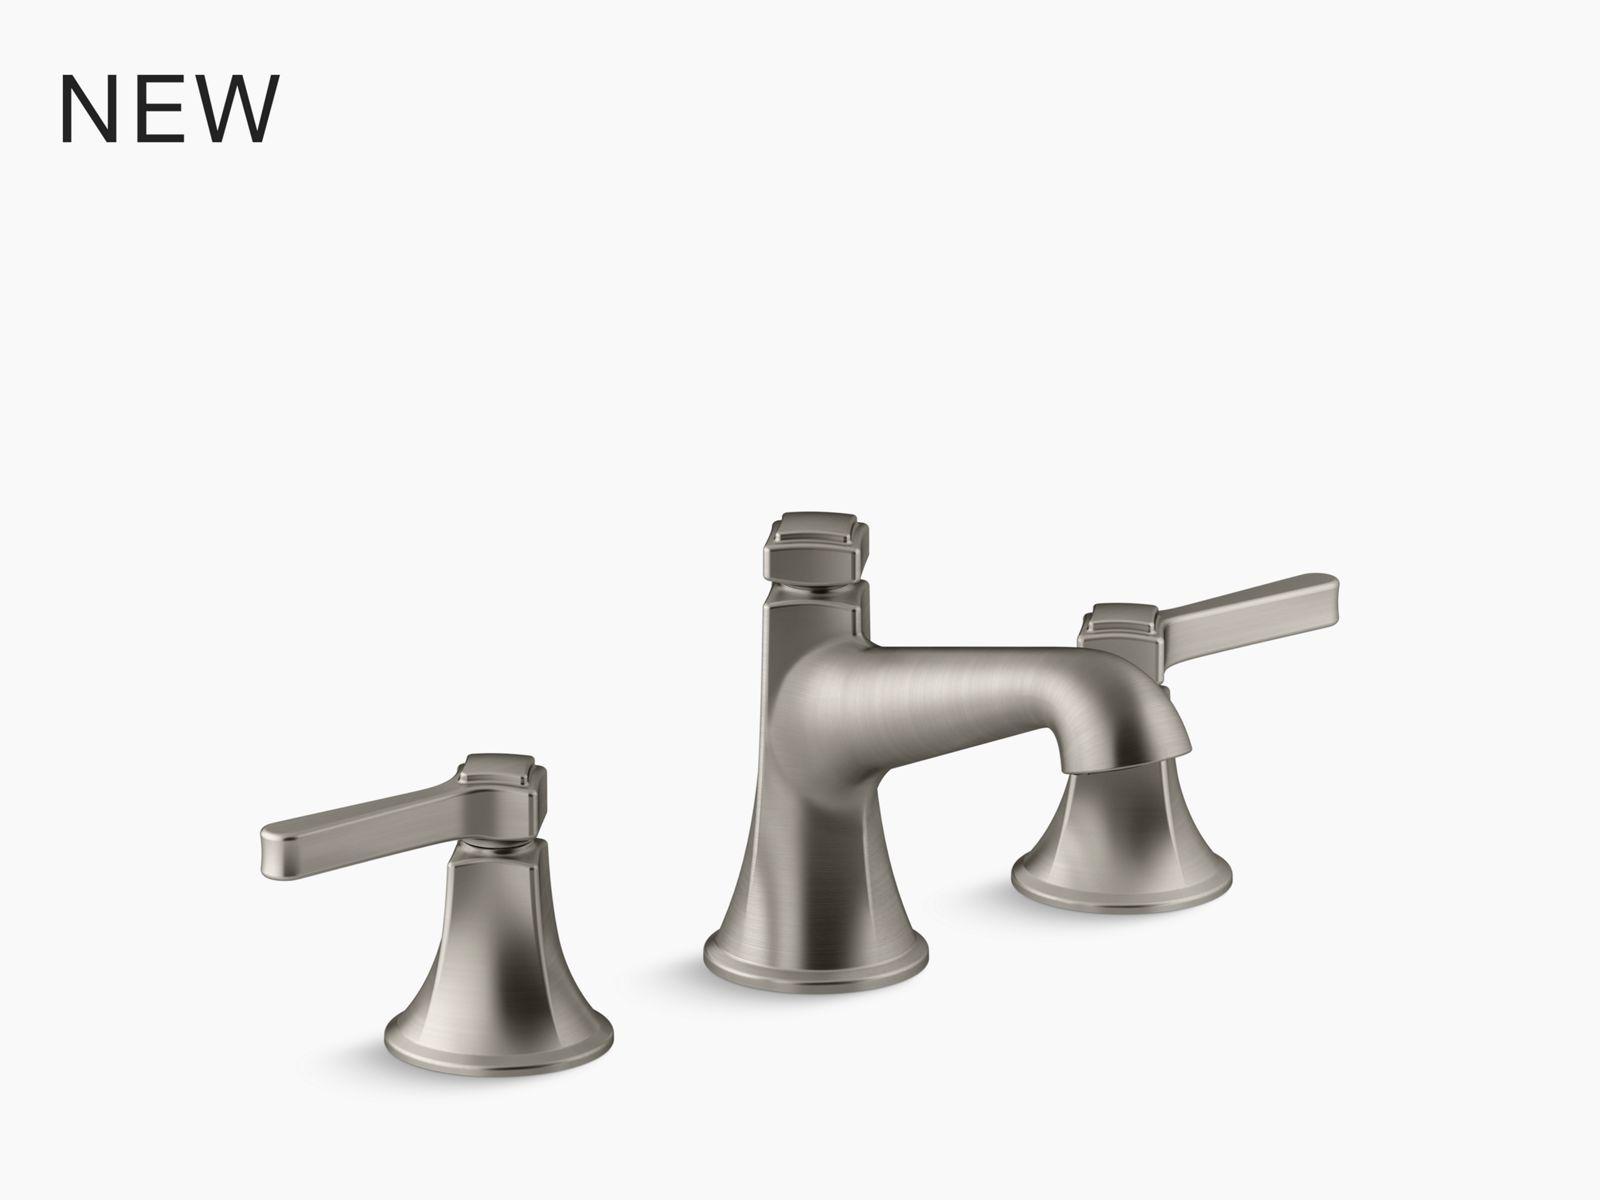 caxton oval 17 x 14 undermount bathroom sink with overflow